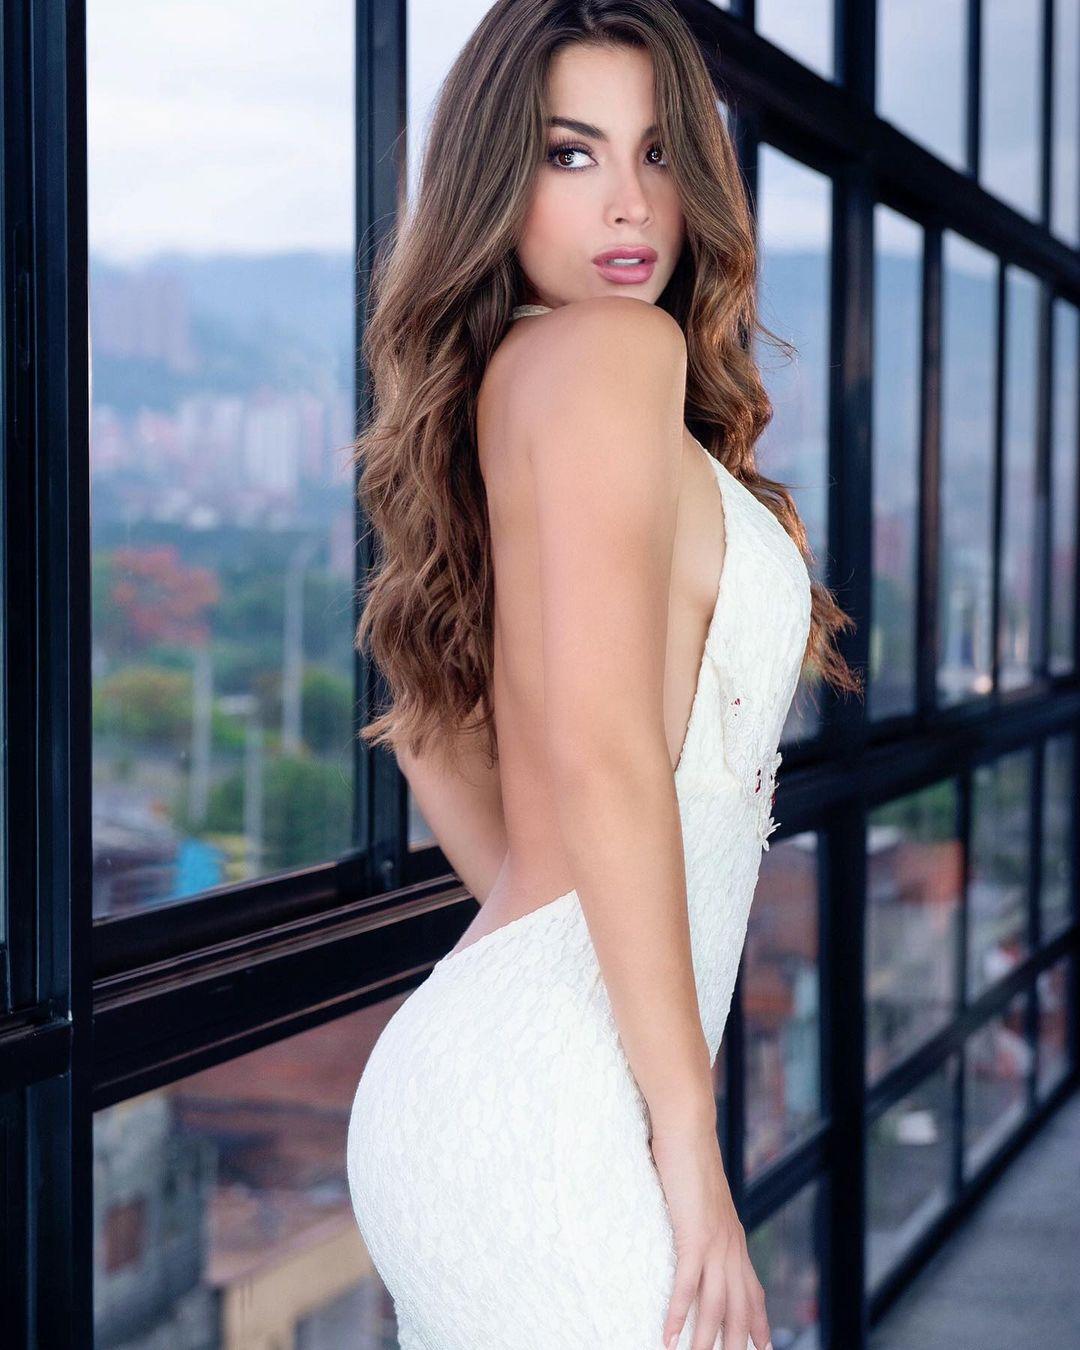 maria alejandra lopez perez, top 2 de miss universe colombia 2021/reyna hispanoamericana 2013/miss caraibes hibiscus 2014/miss colombia mundo 2015. - Página 3 24057817